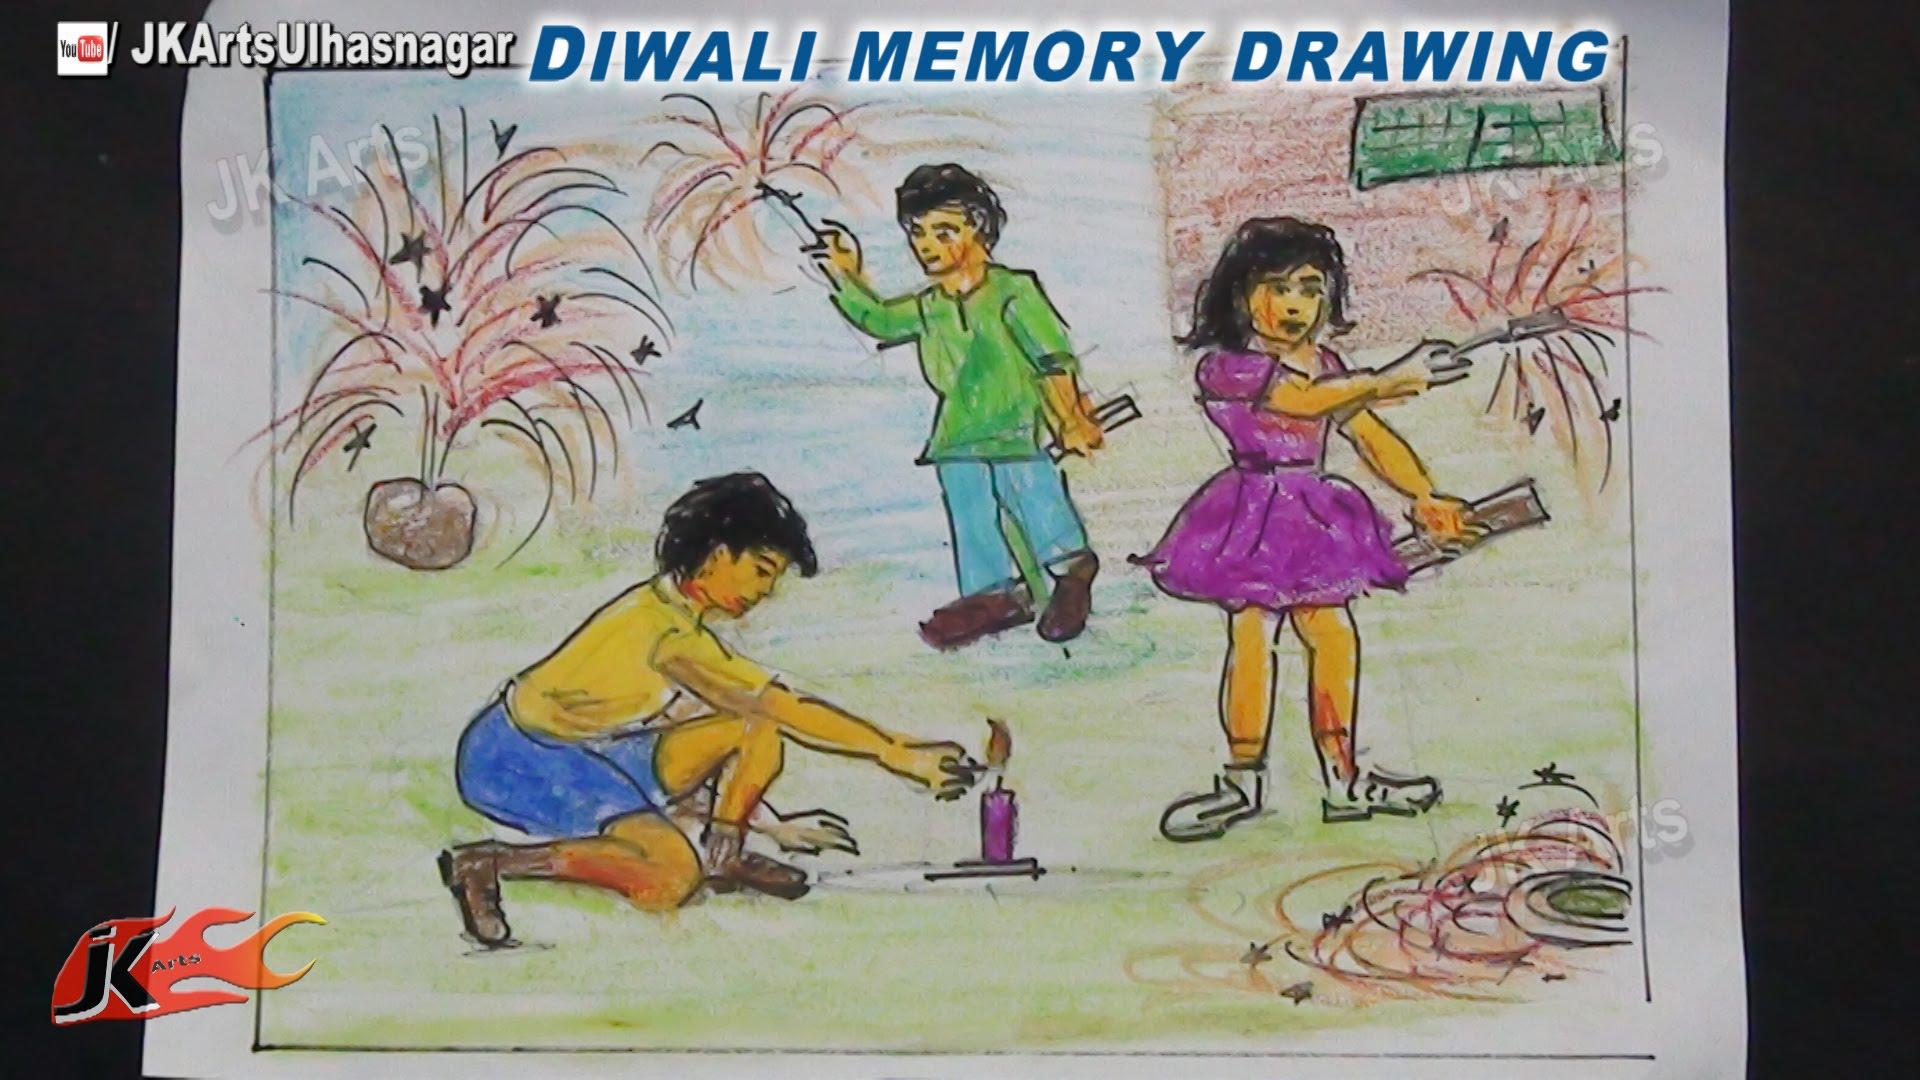 1920x1080 Happy Diwali Memory Drawing How To Draw Jk Arts 754